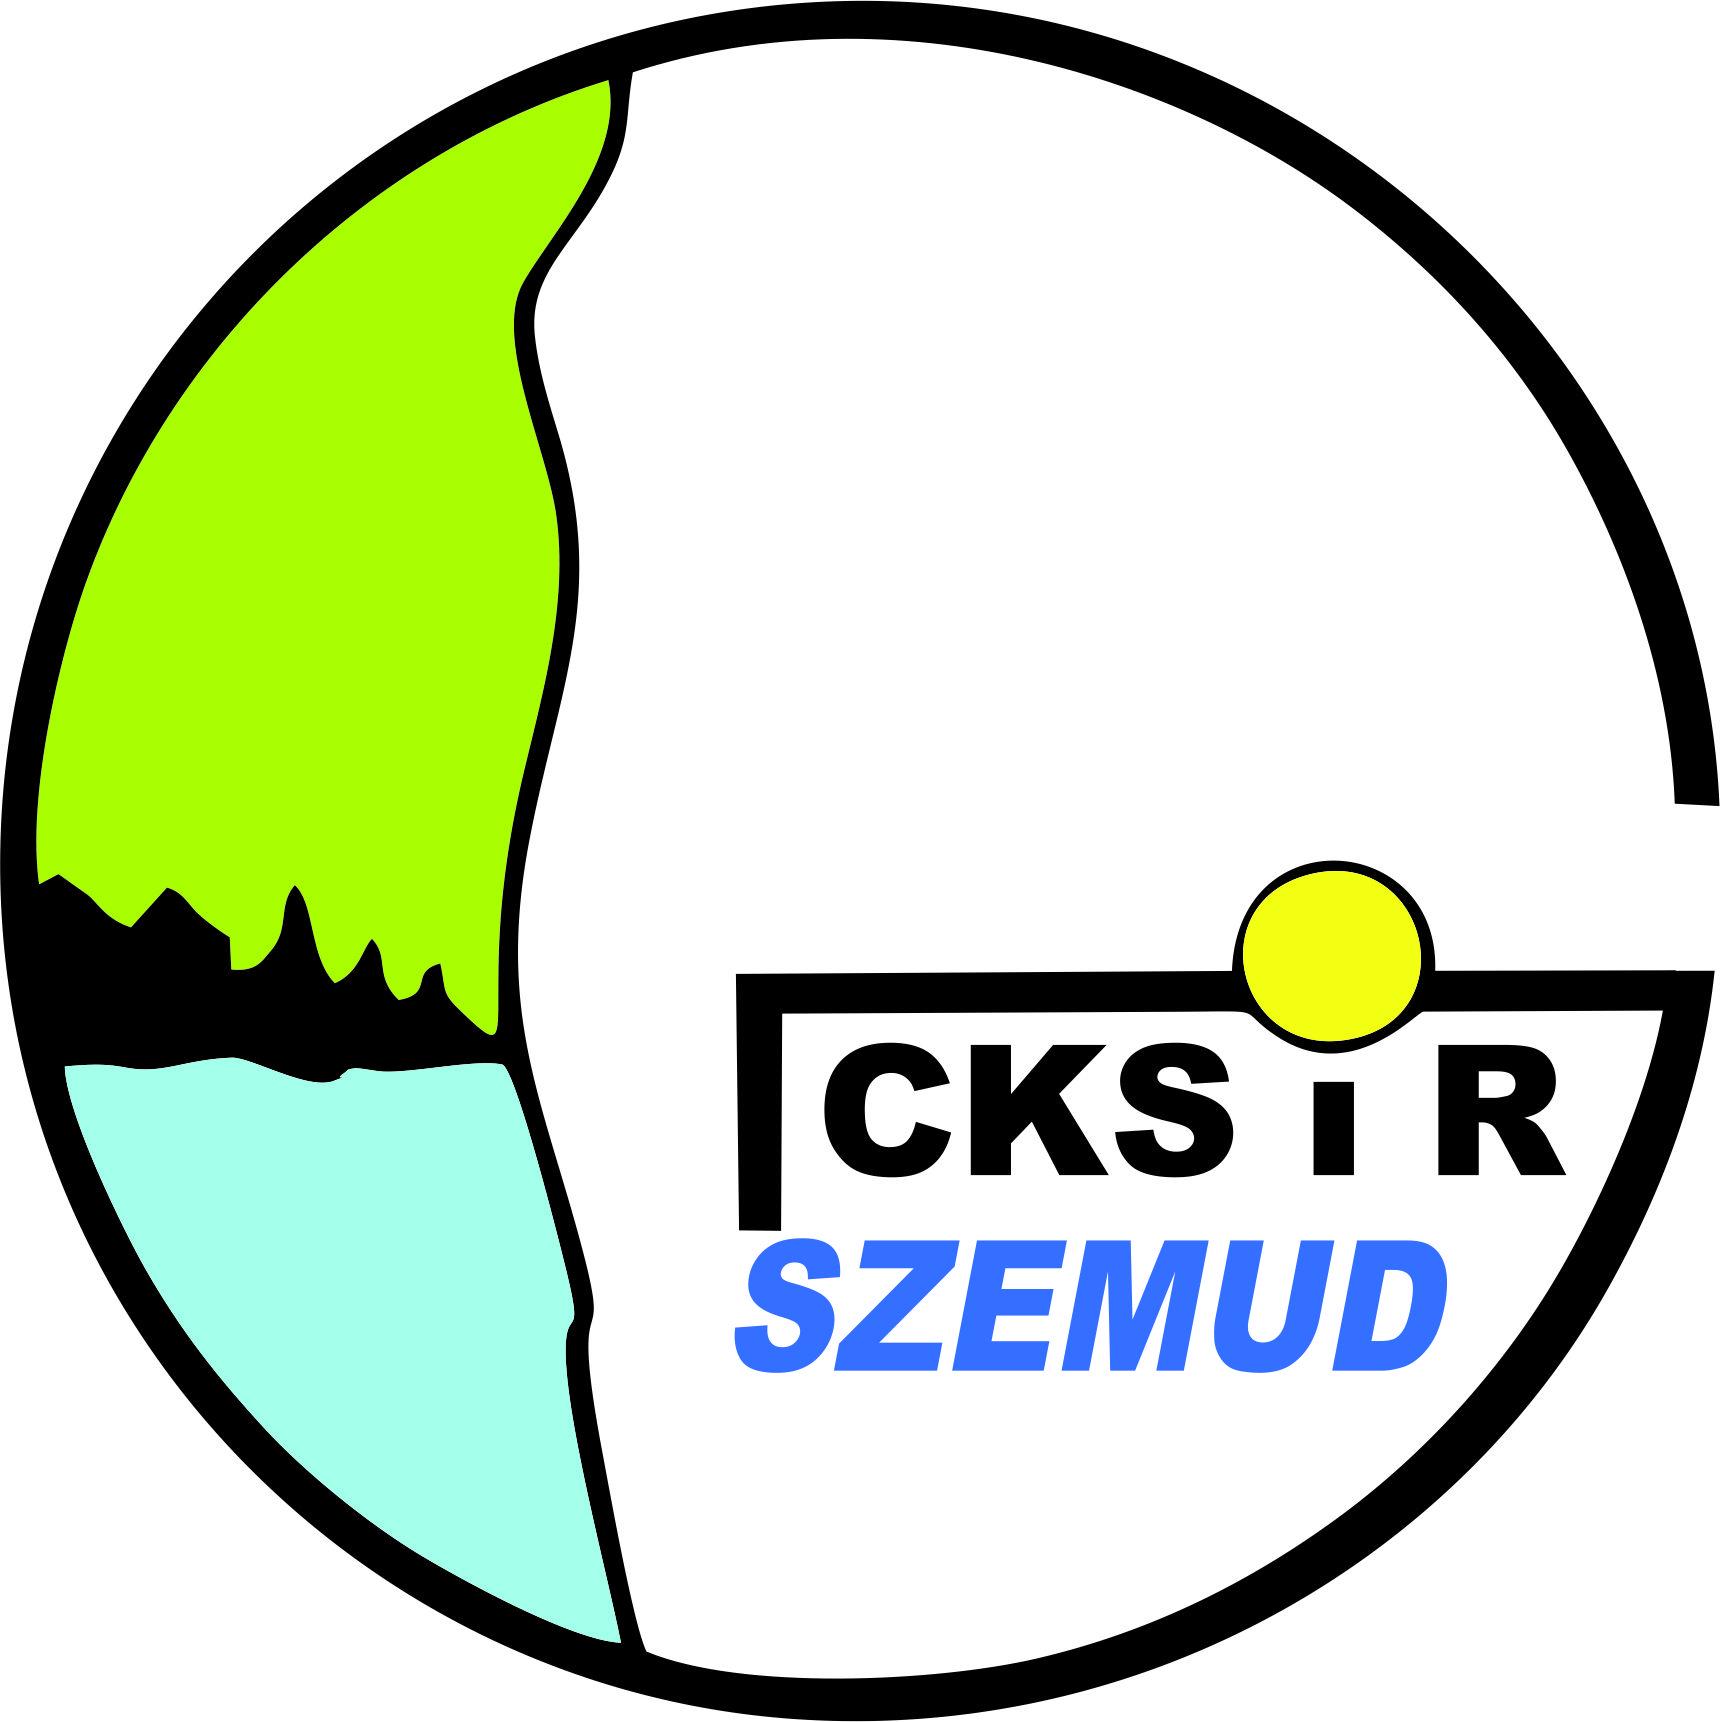 gcksir-logo